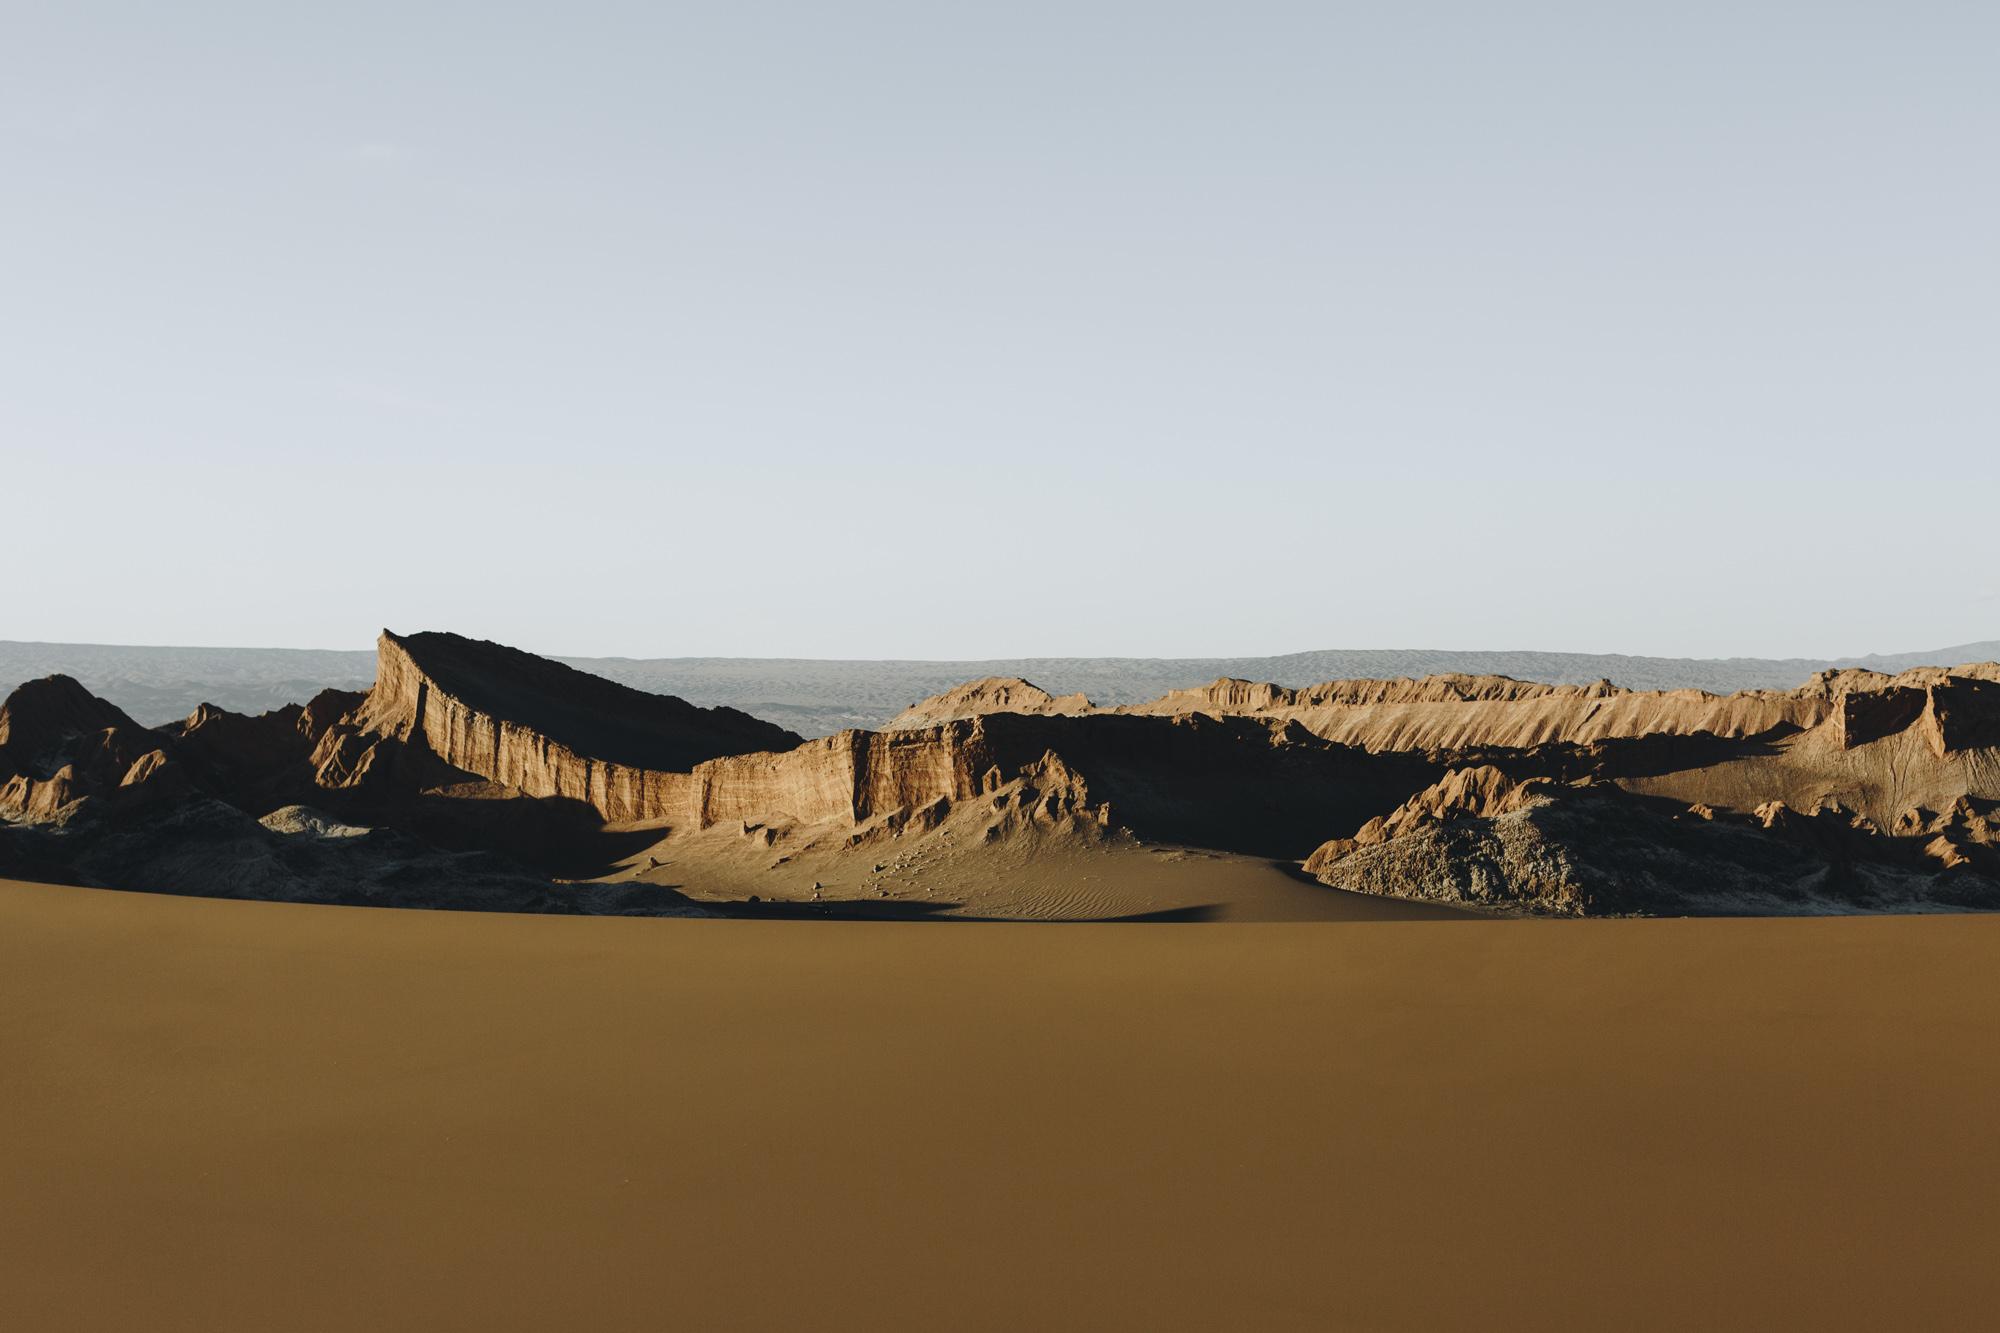 Mael Lambla photographer Chile San pedro atacama desert-152.jpg